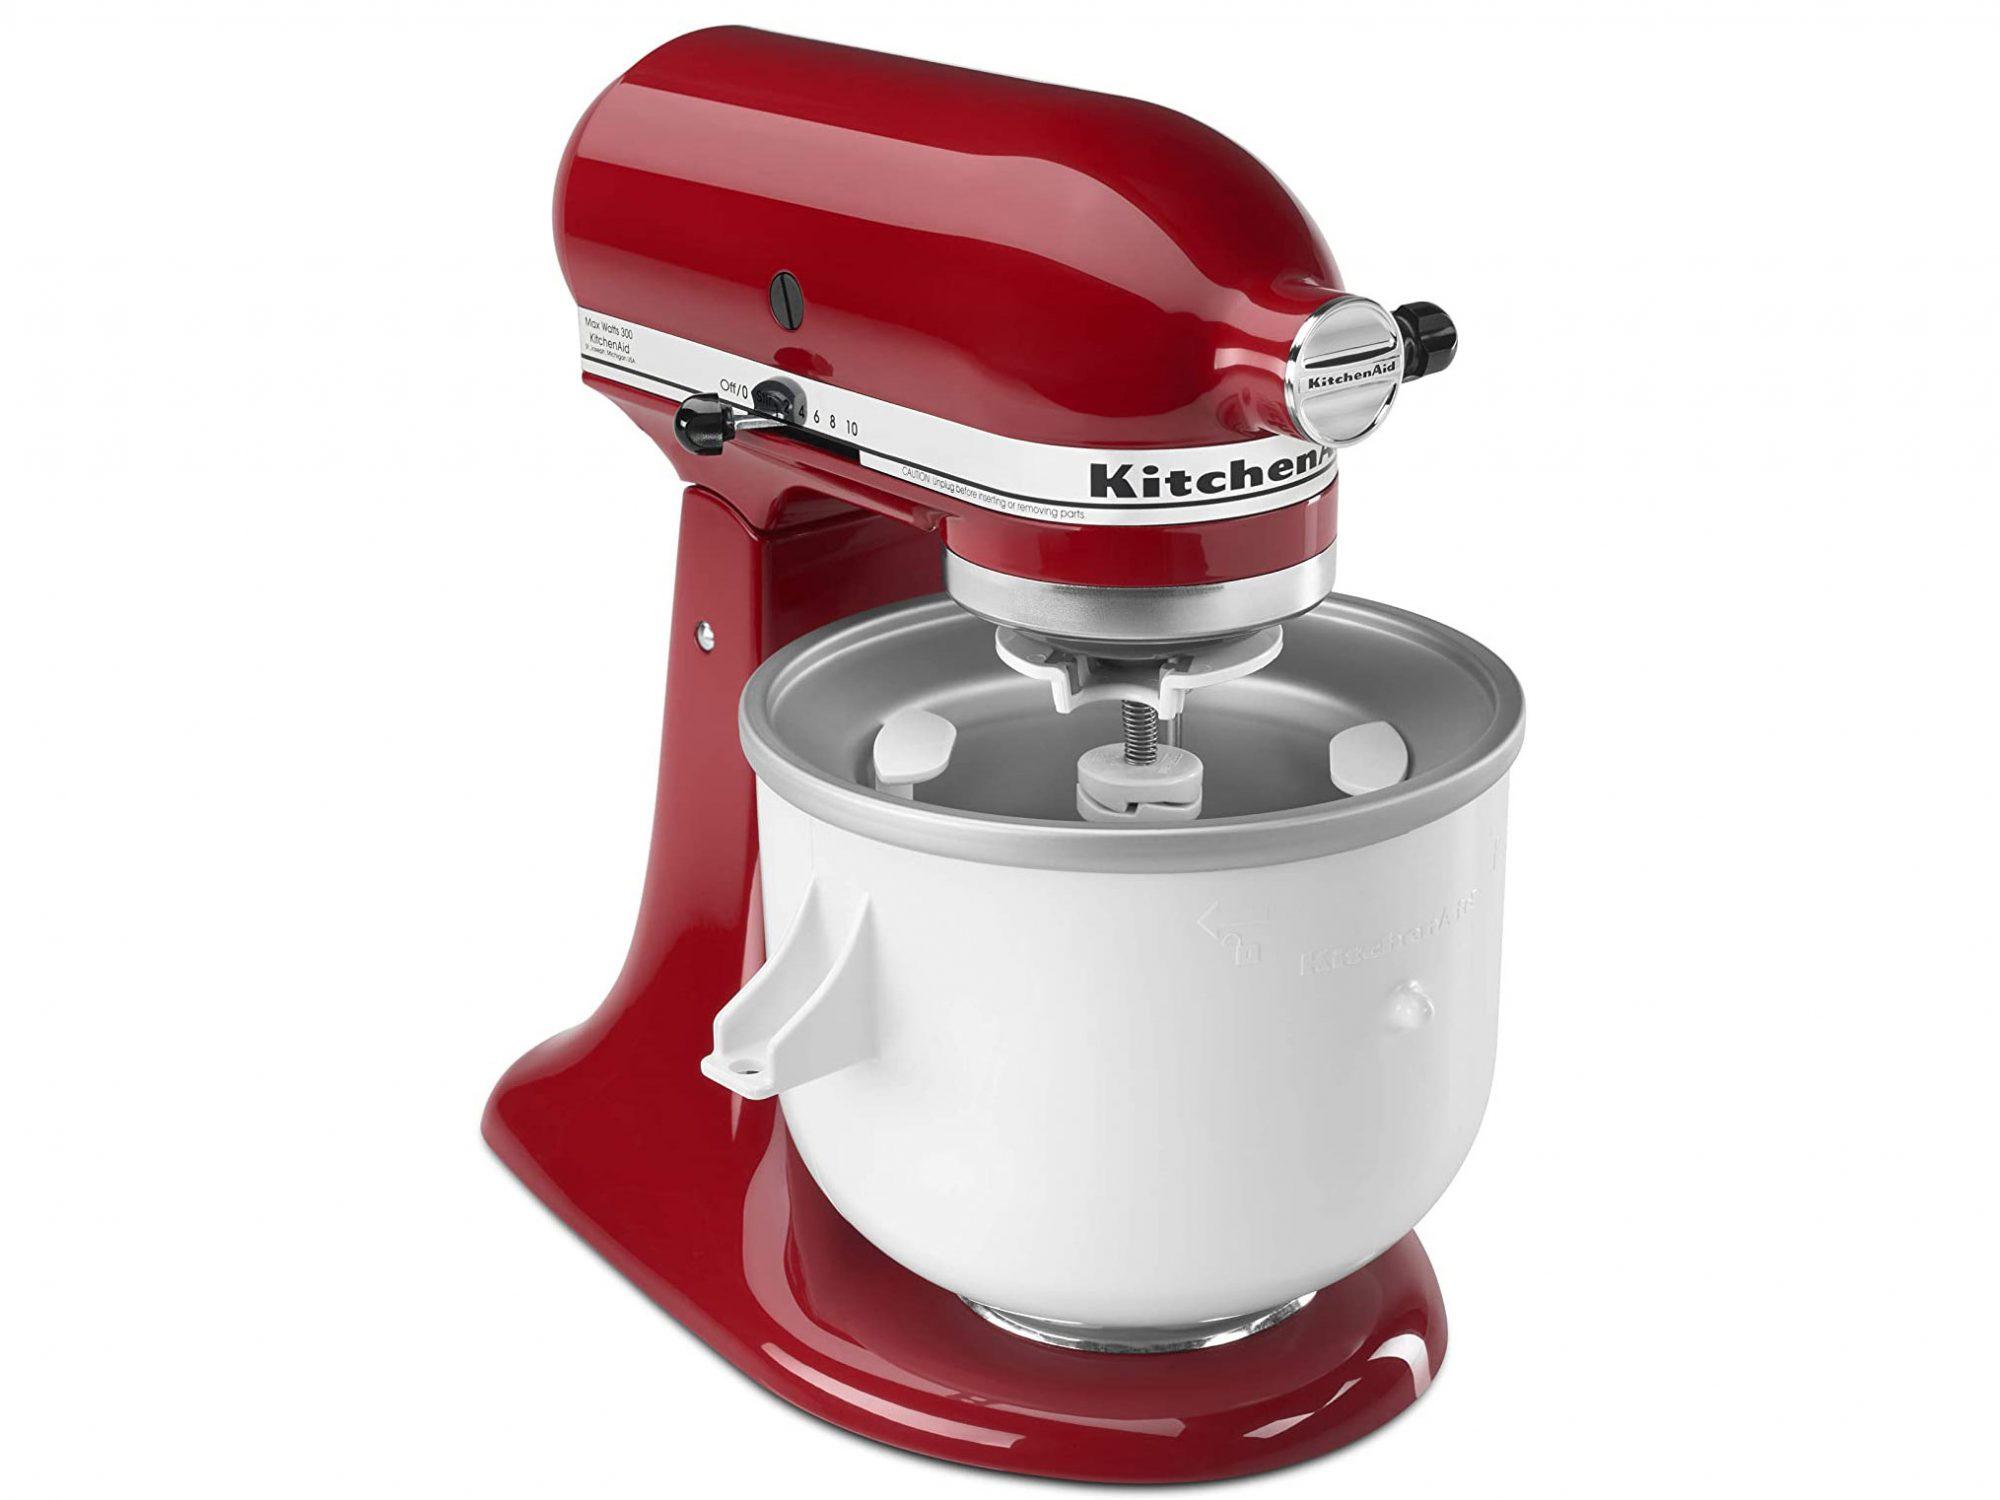 Ways to Use Ice Cream Maker: KitchenAid KICA0WH 2 Quart Ice Cream Maker Stand Mixer Attachment